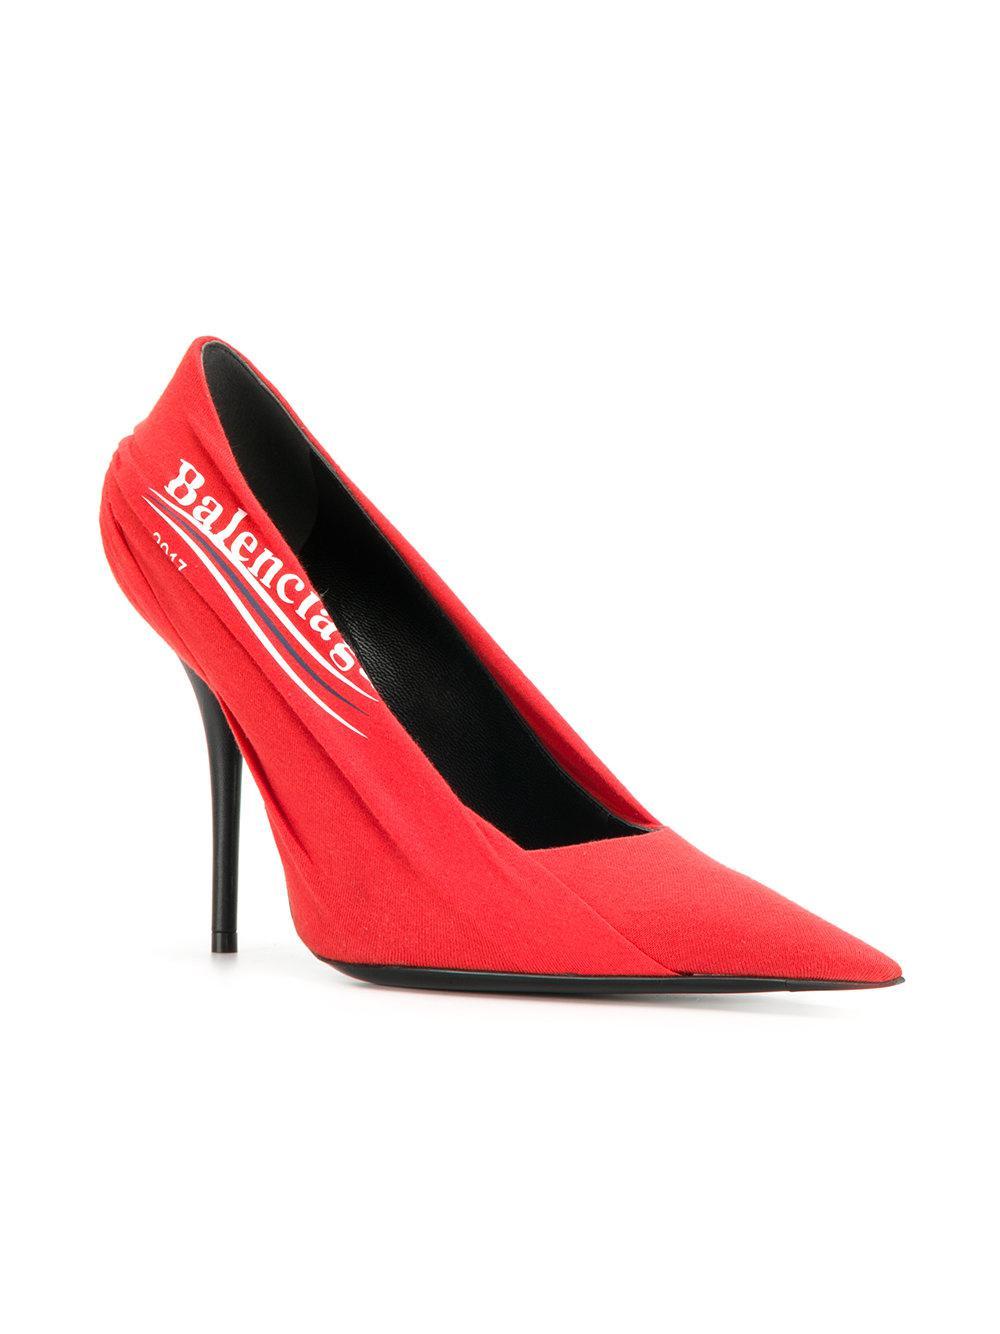 Miu Miu Red Campaign Logo Knife Heels